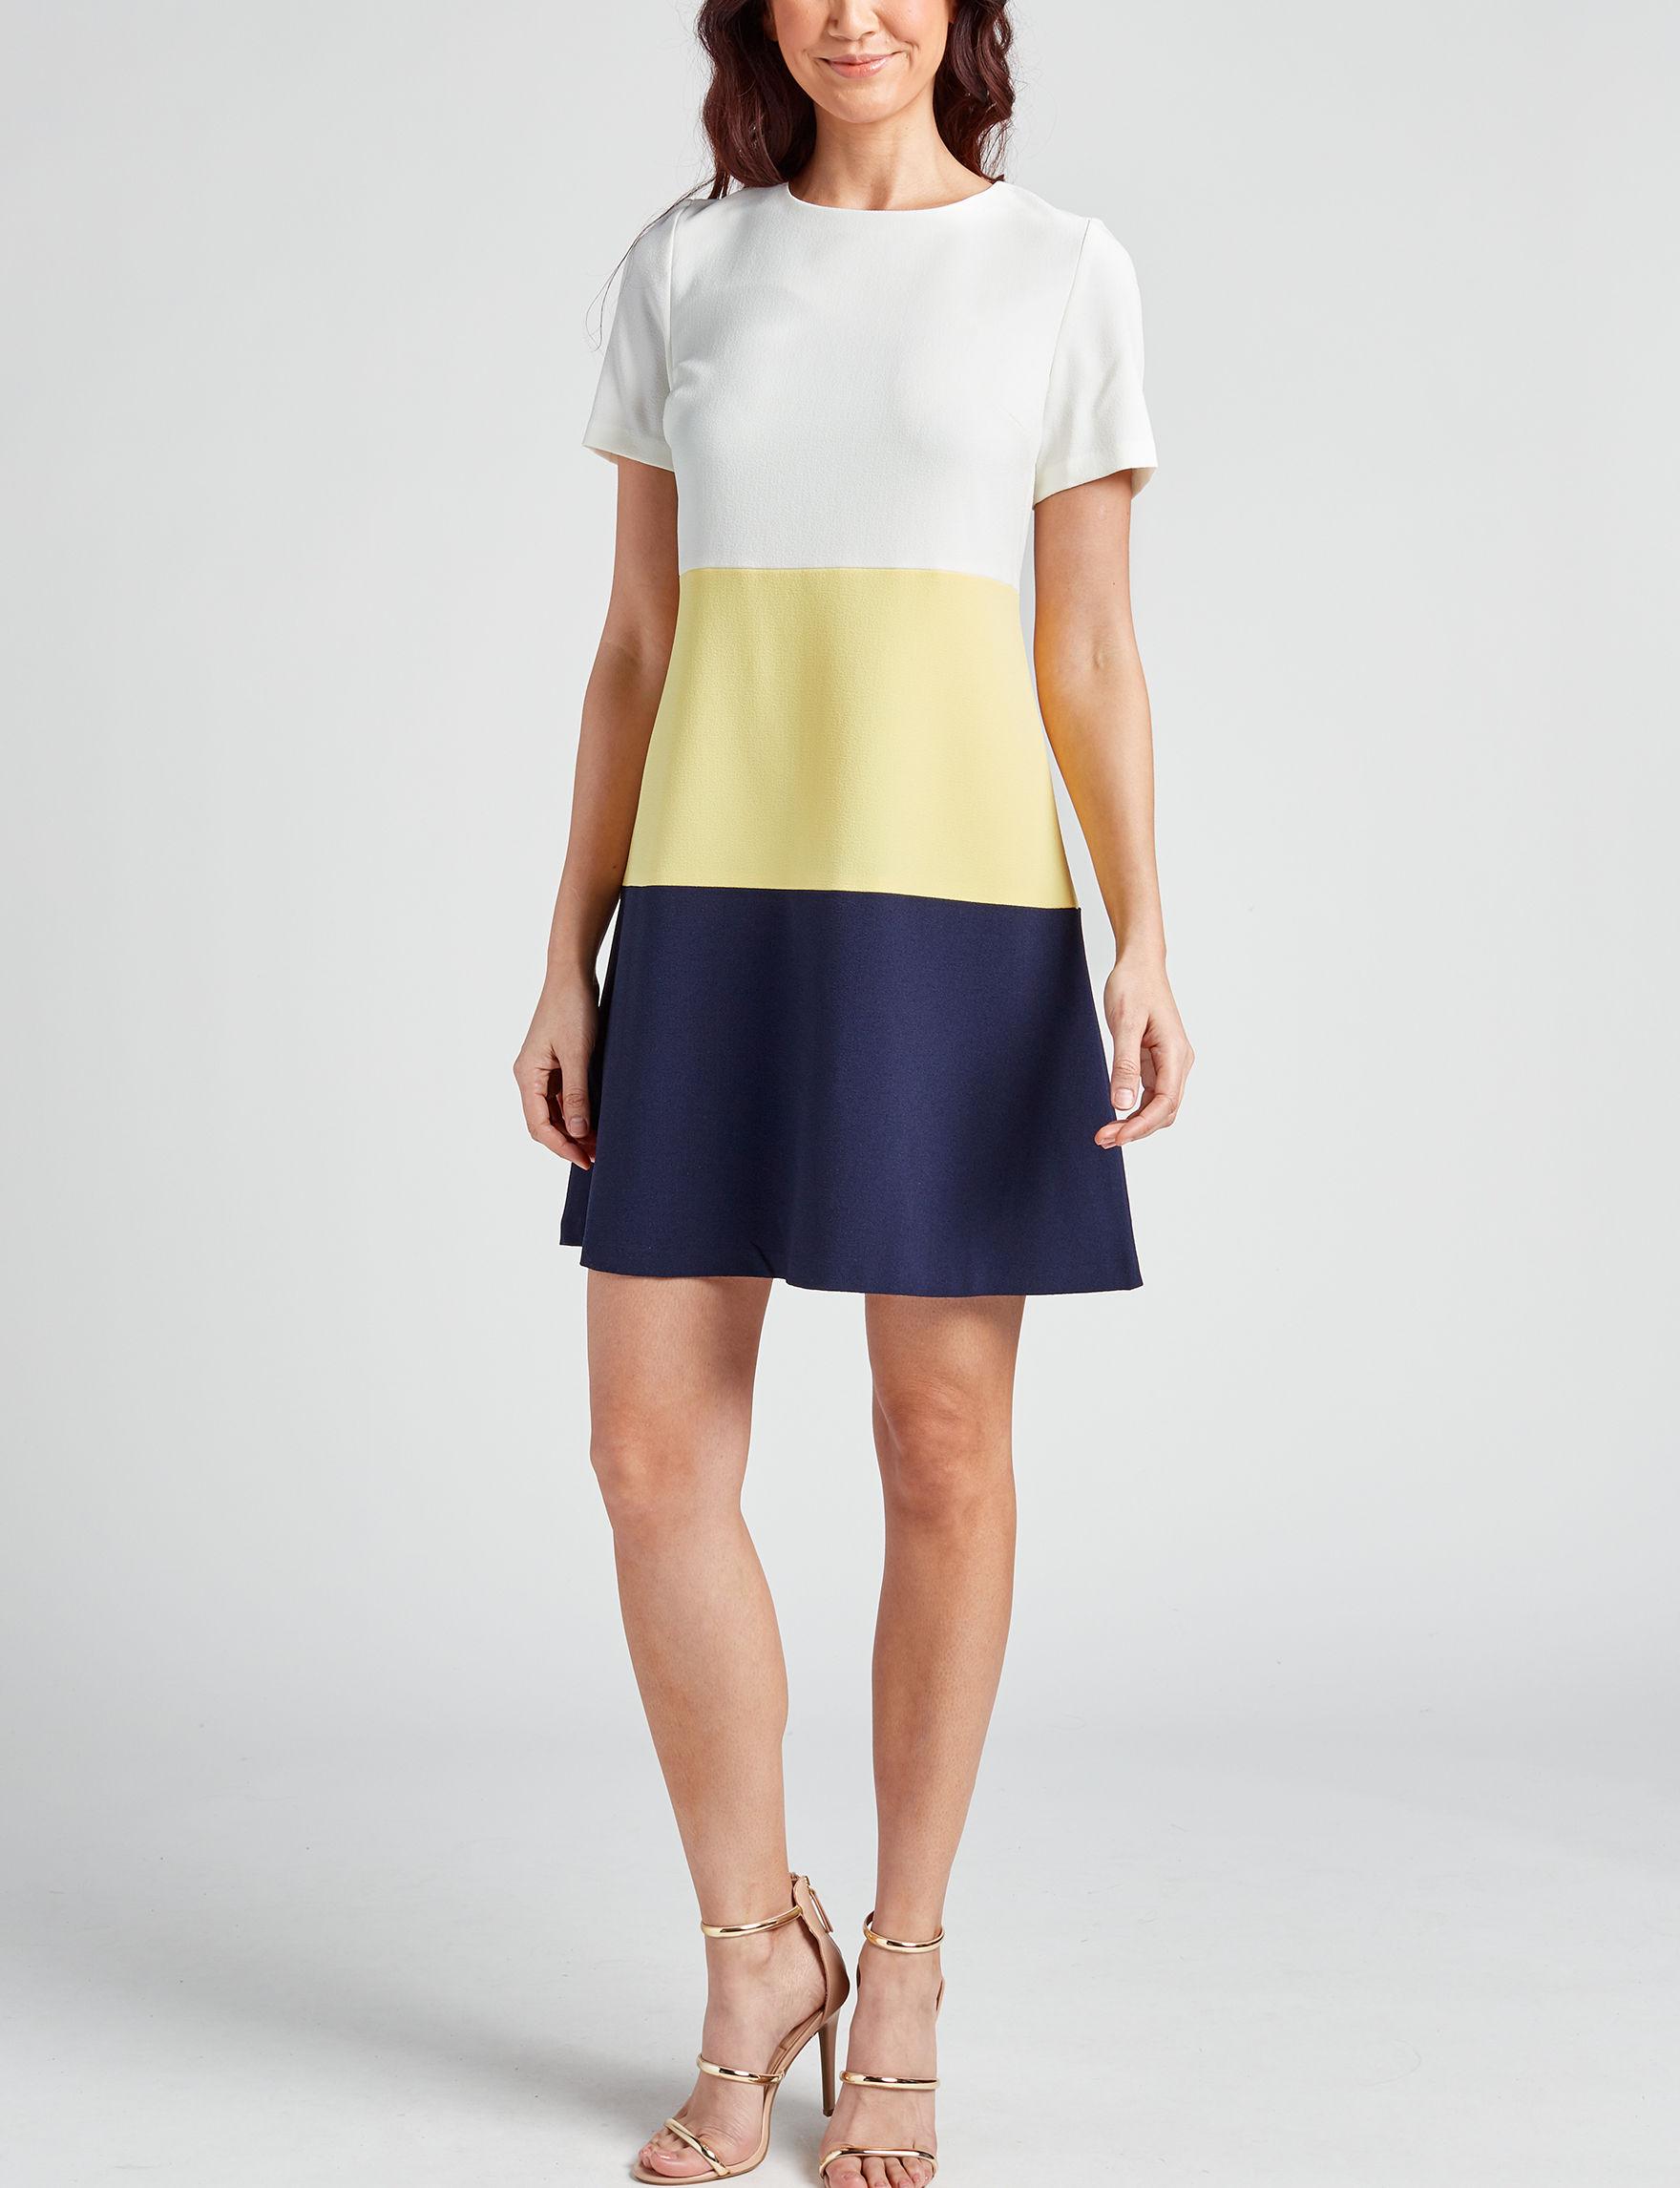 Sandra Darren White Multi Everyday & Casual A-line Dresses Fit & Flare Dresses